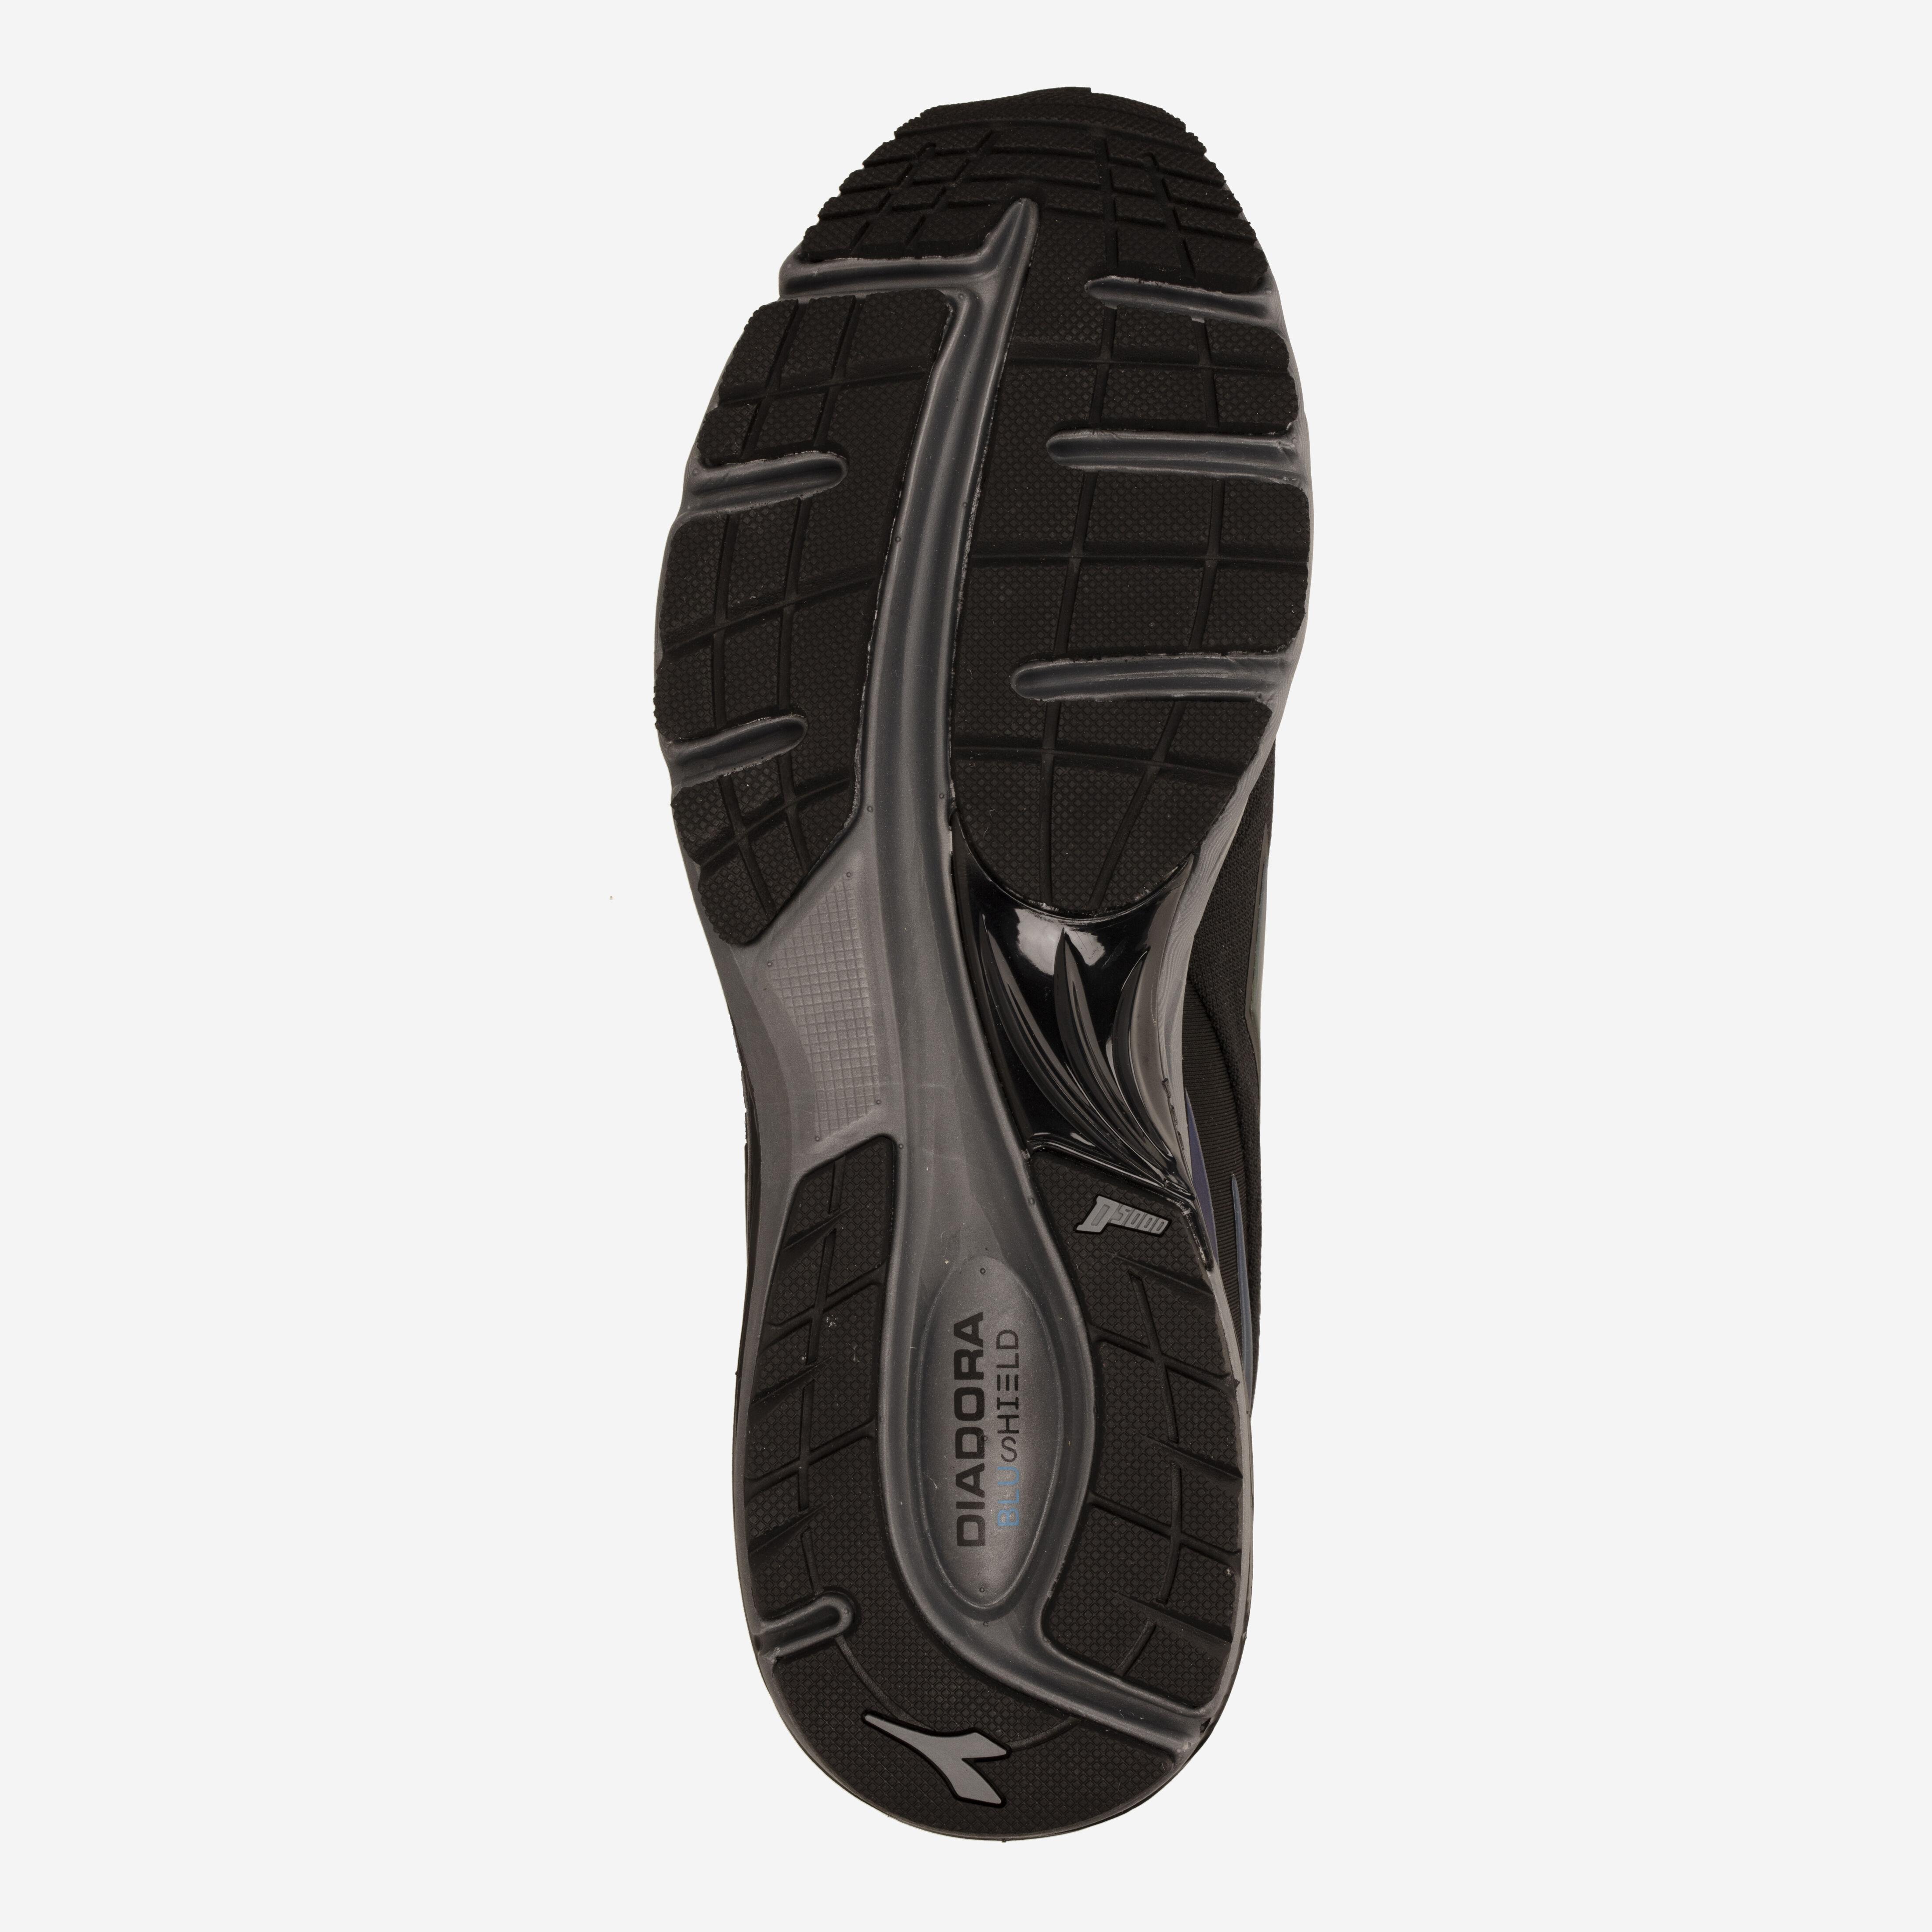 Diadora Mythos Blushield Hip 3 shoes 2019